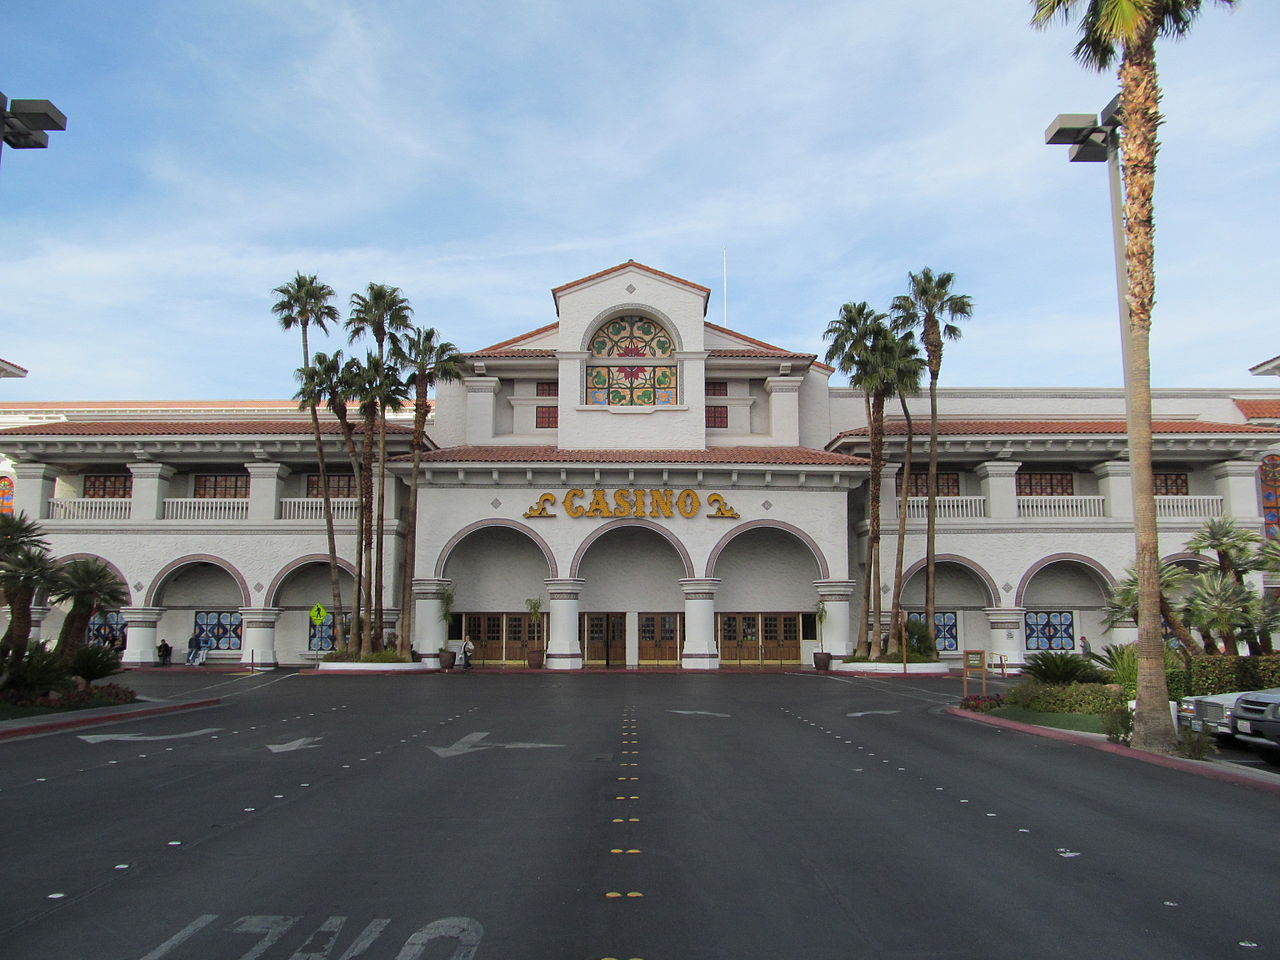 las vegas gold coast hotel & casino